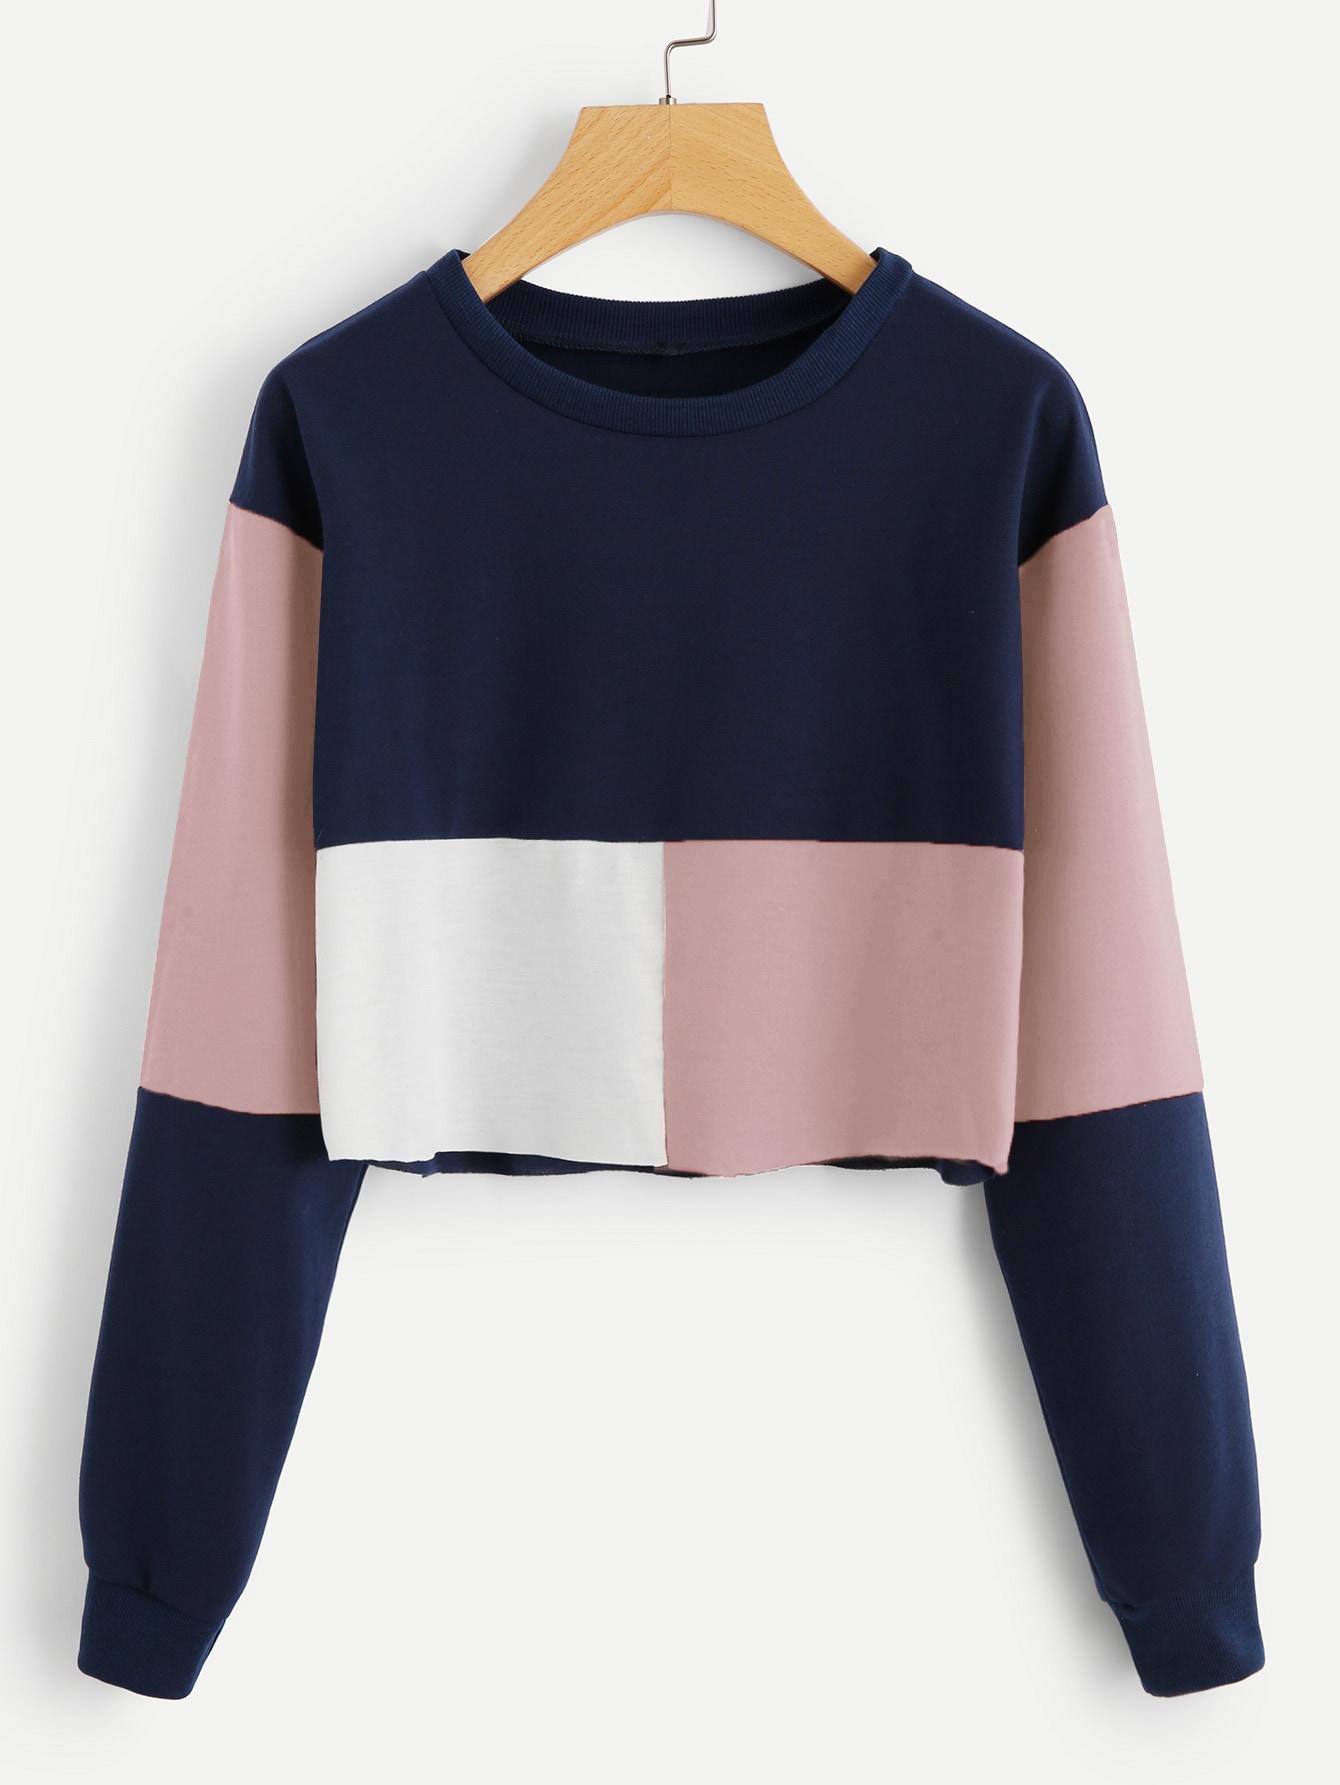 Купить Цветная кусковая закройная спортивная футболка, null, SheIn